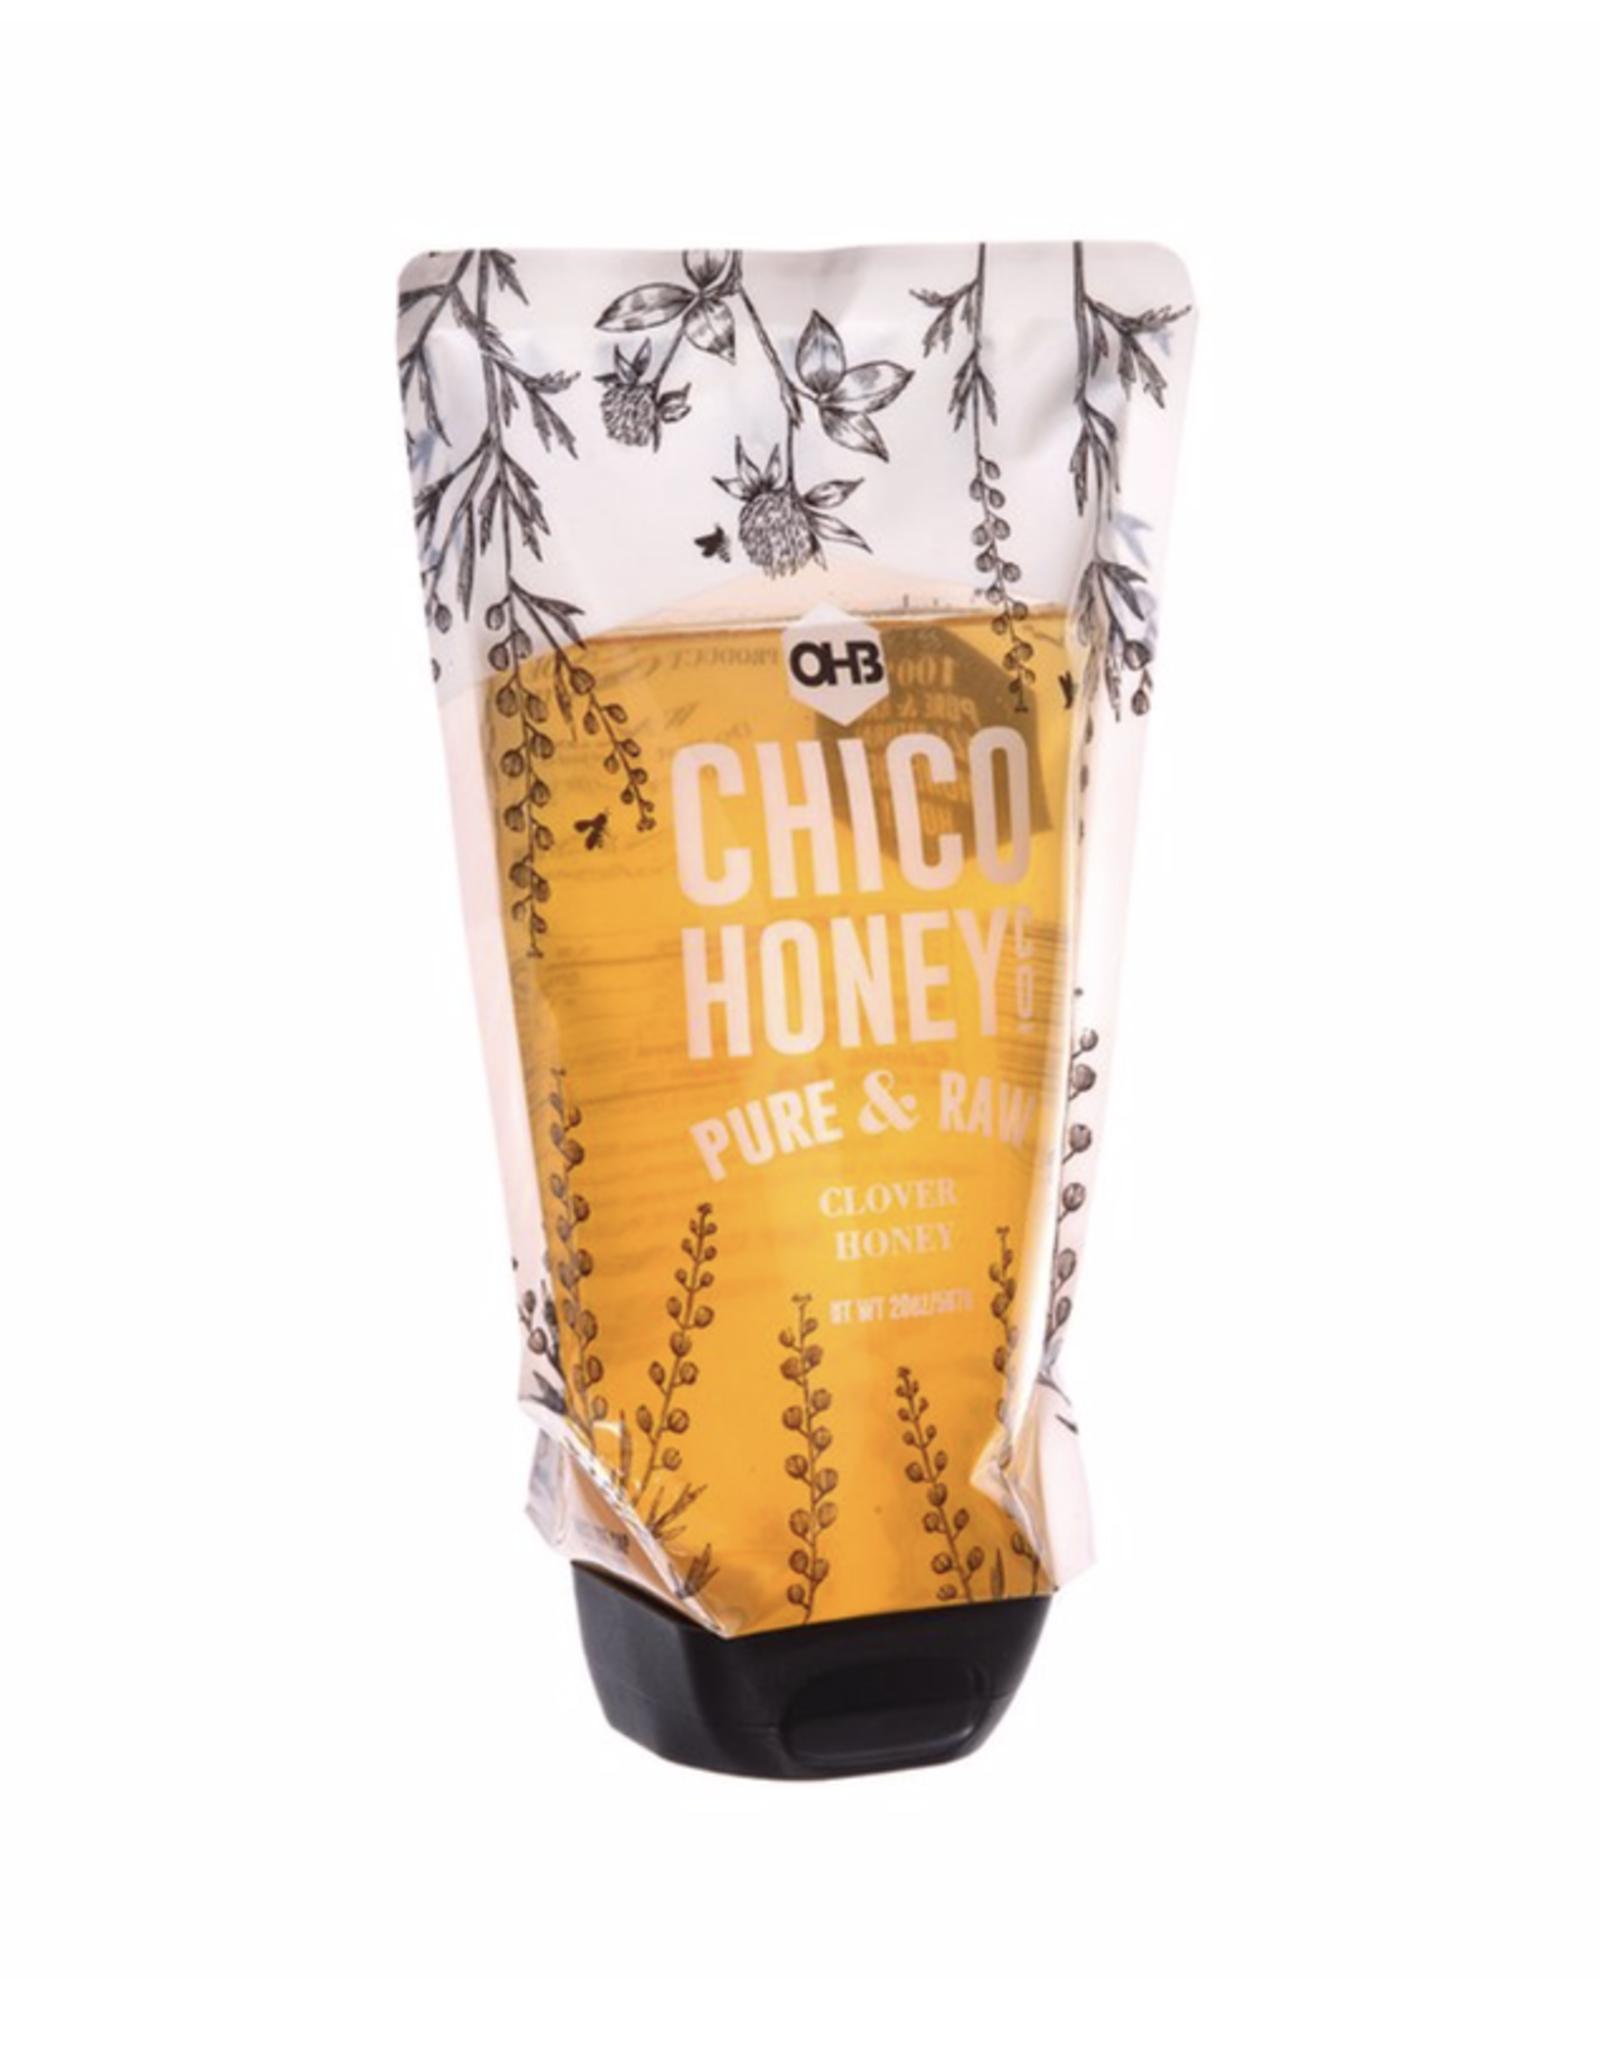 Chico Honey Co Chico Honey Co Montana Sweet Clover Honey Squeeze Pouch 20oz